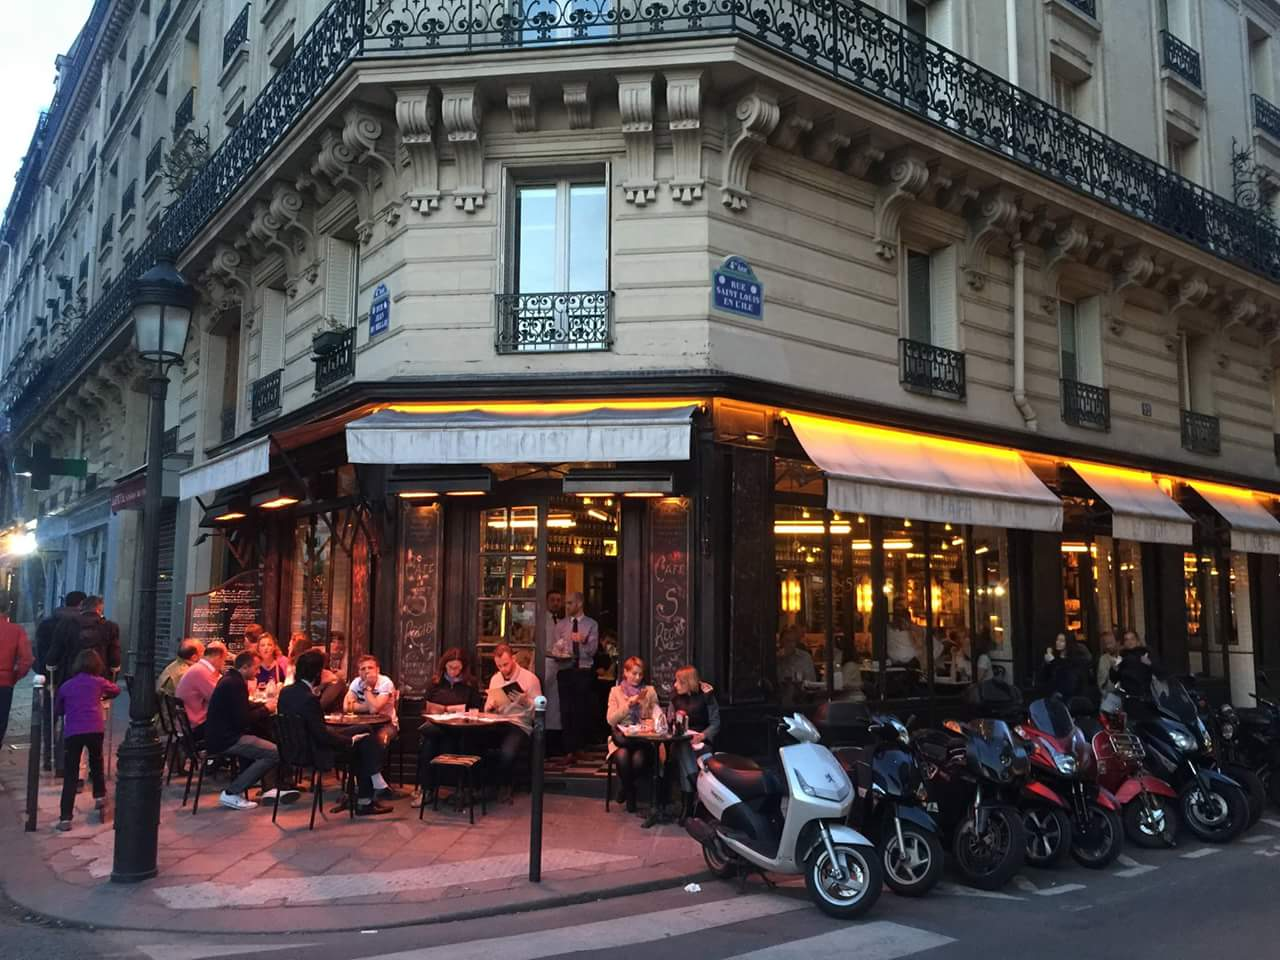 St Regis Cafe Paris.jpg